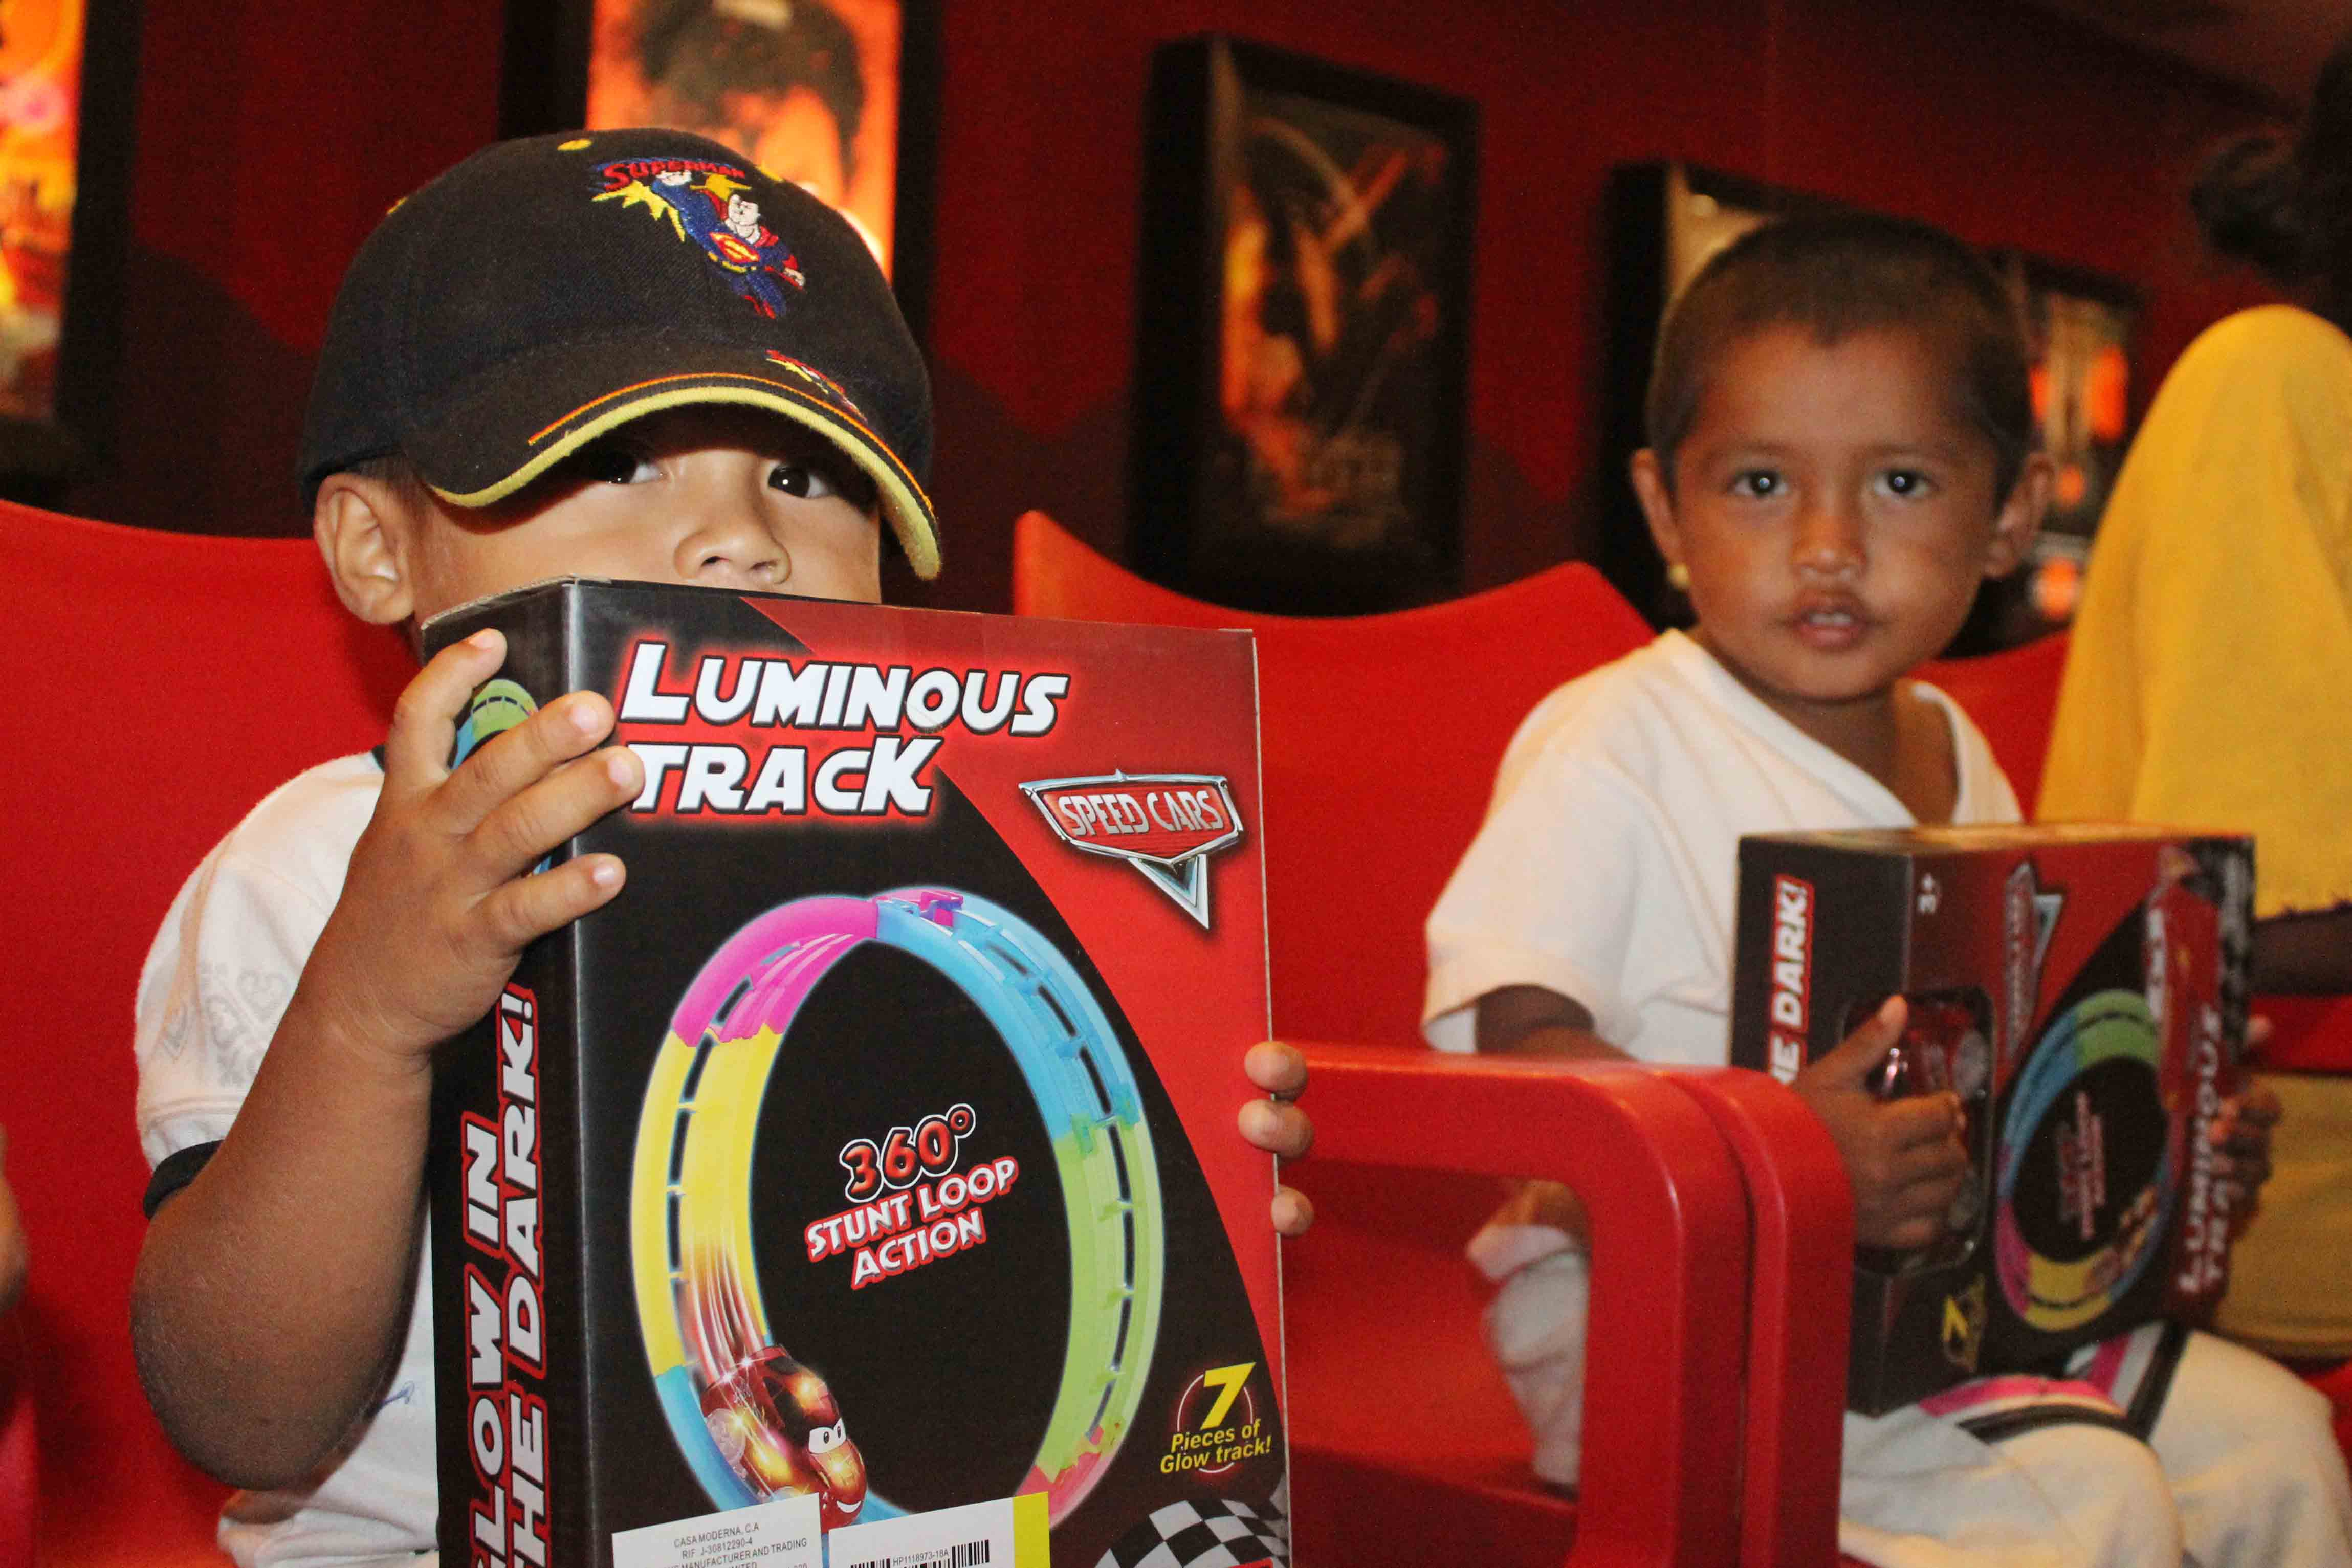 Gmcp garantiza Navidades Felices a través de cine-foro y entrega de juguetes (1)